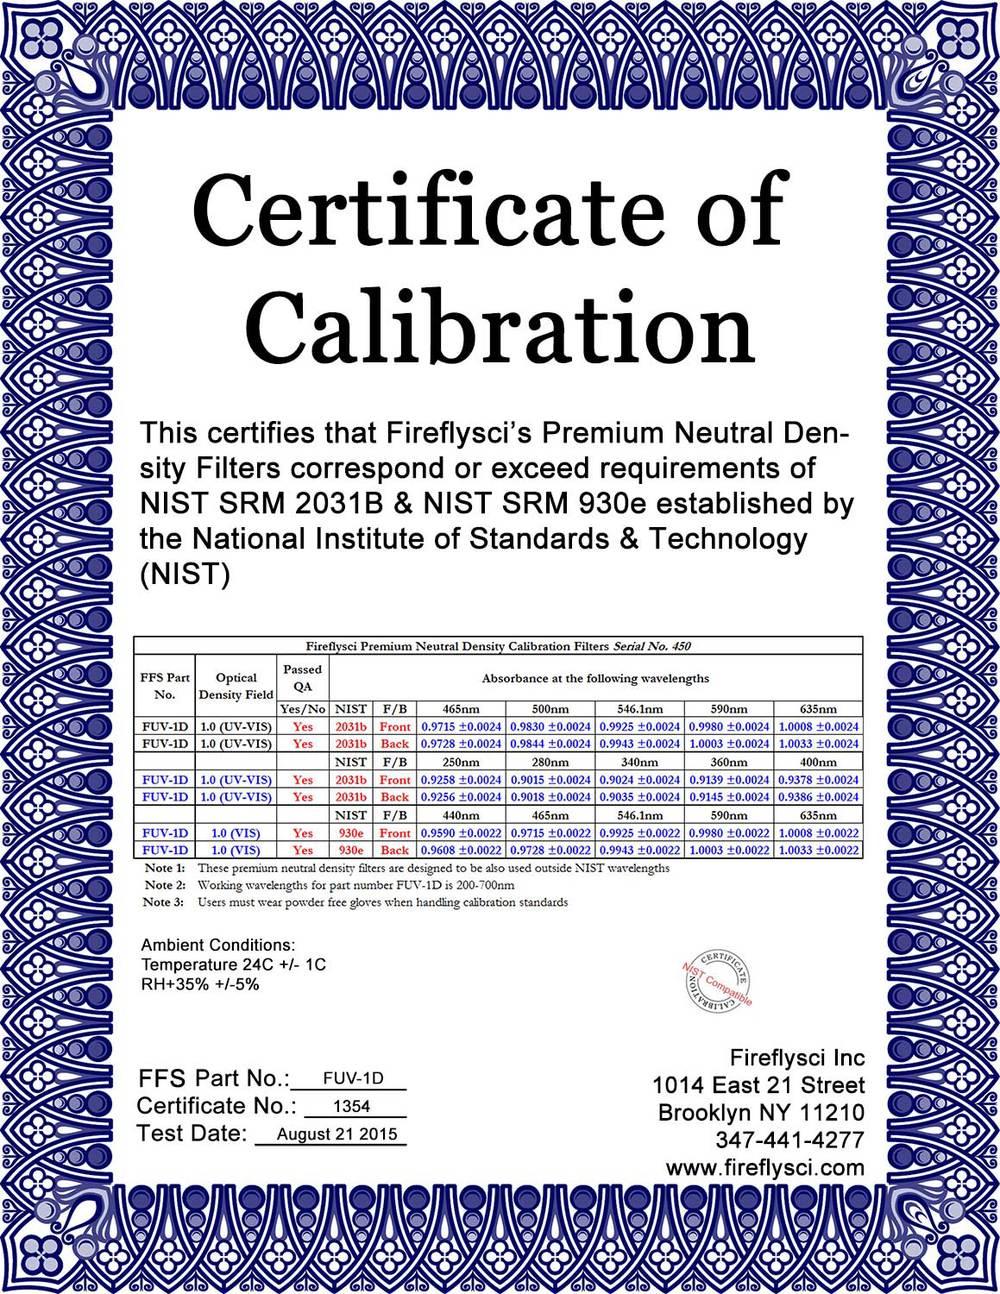 Sample FUV-1.0D Certificate of Calibration